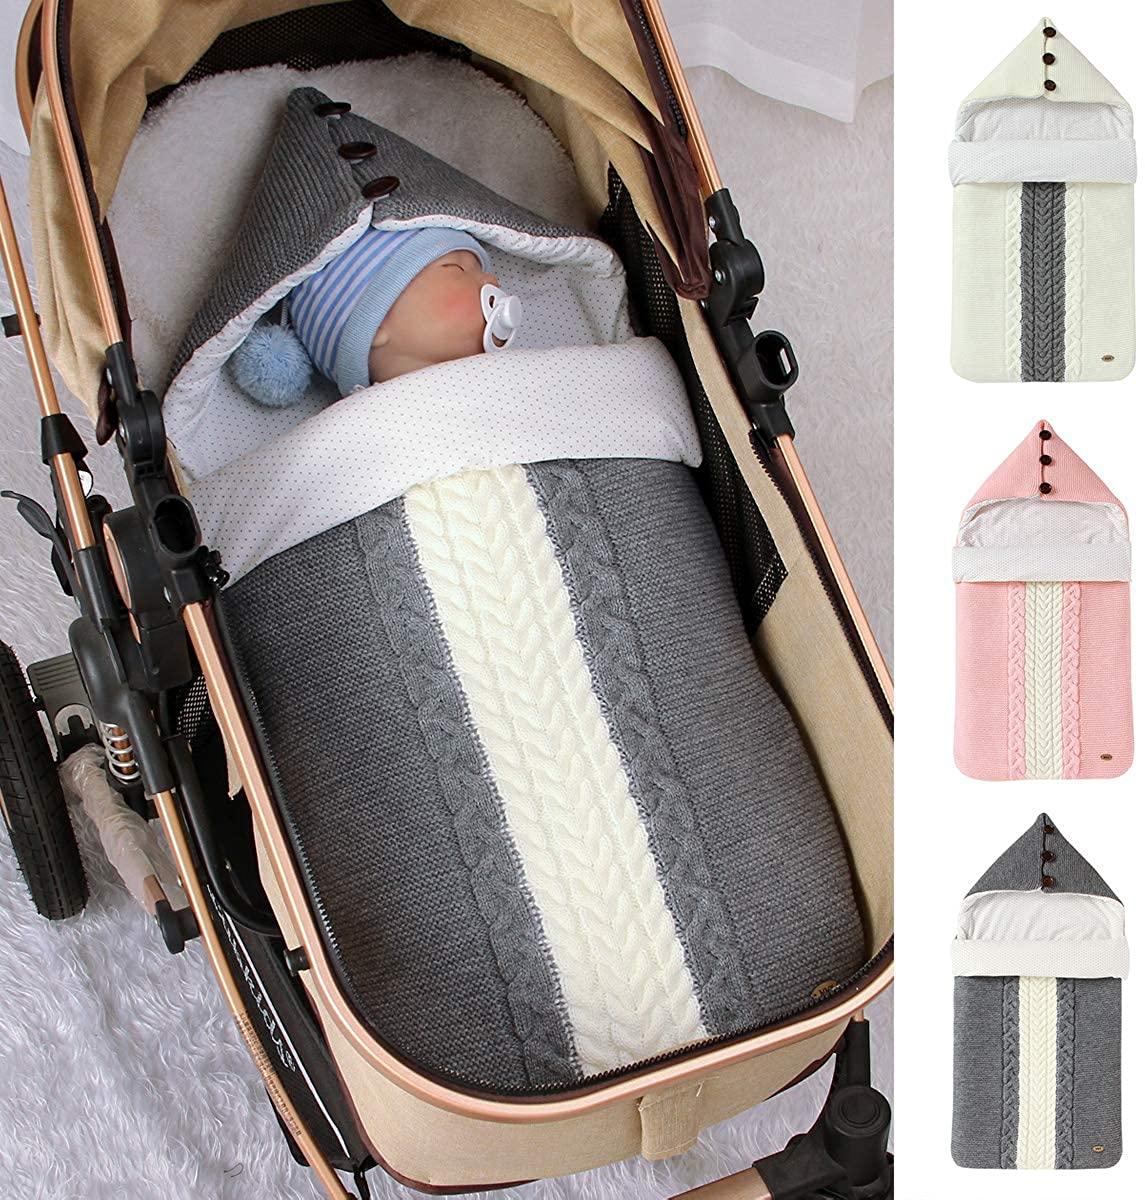 Newborn Baby Swaddle Blanke Stroller Wrap Warm Sleeping Bag Infant Soft Hooded Knit Sleeping Sack for 0-12 Month Boys Girls(Beige)